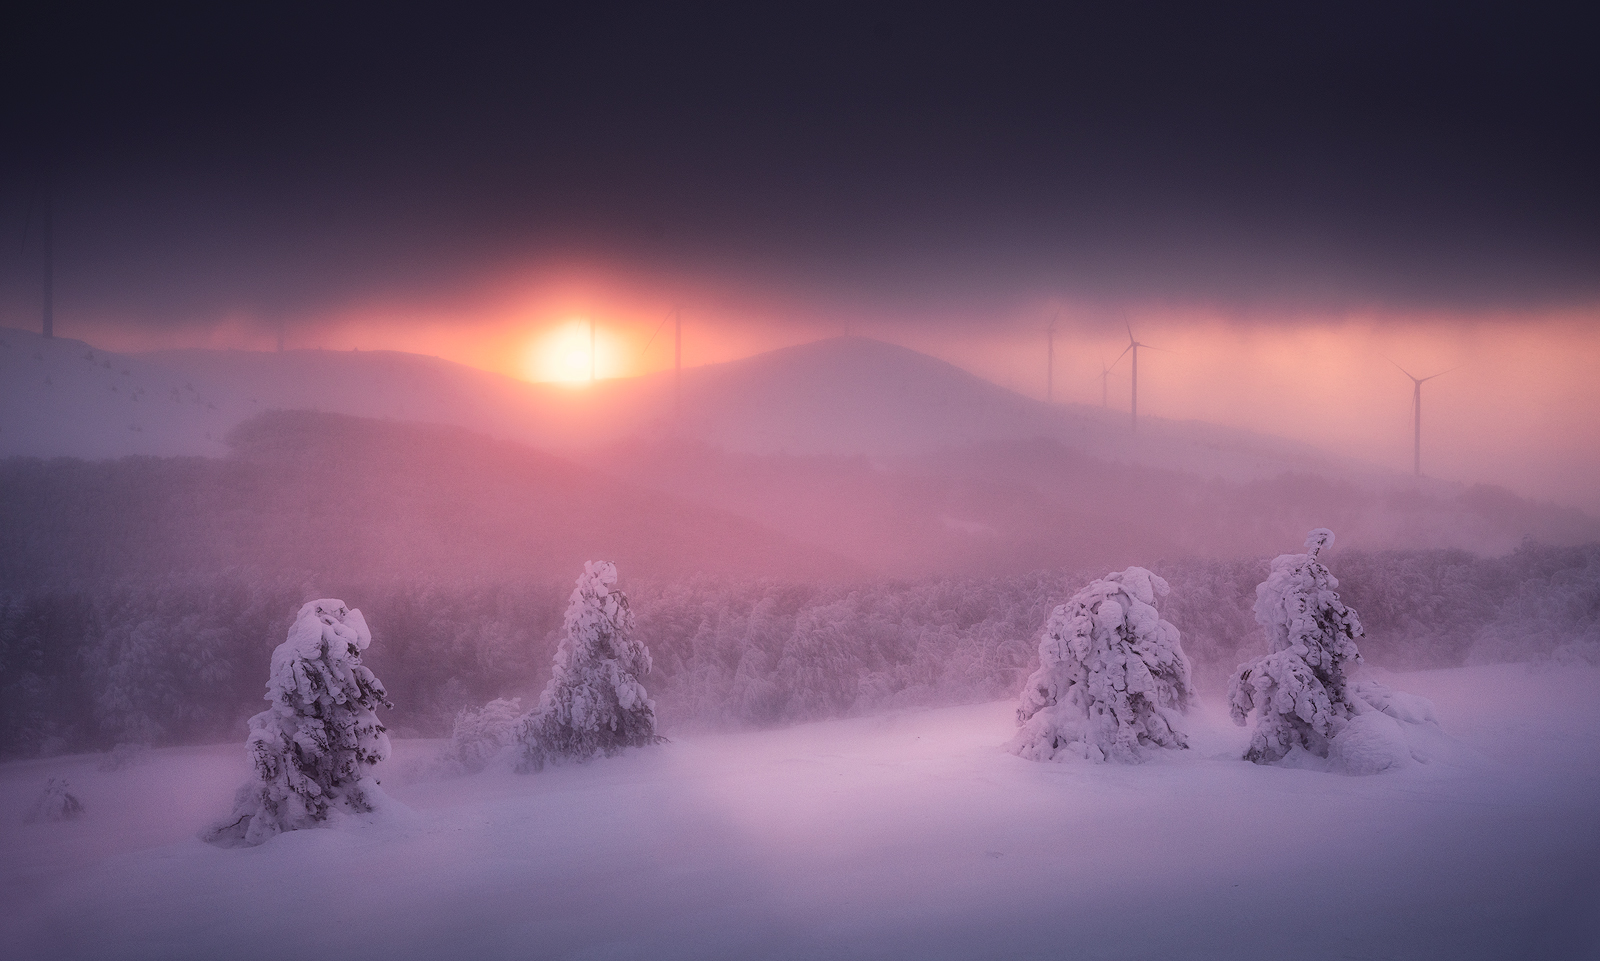 Fireball | Author Иван Миладинов - Jirko | PHOTO FORUM